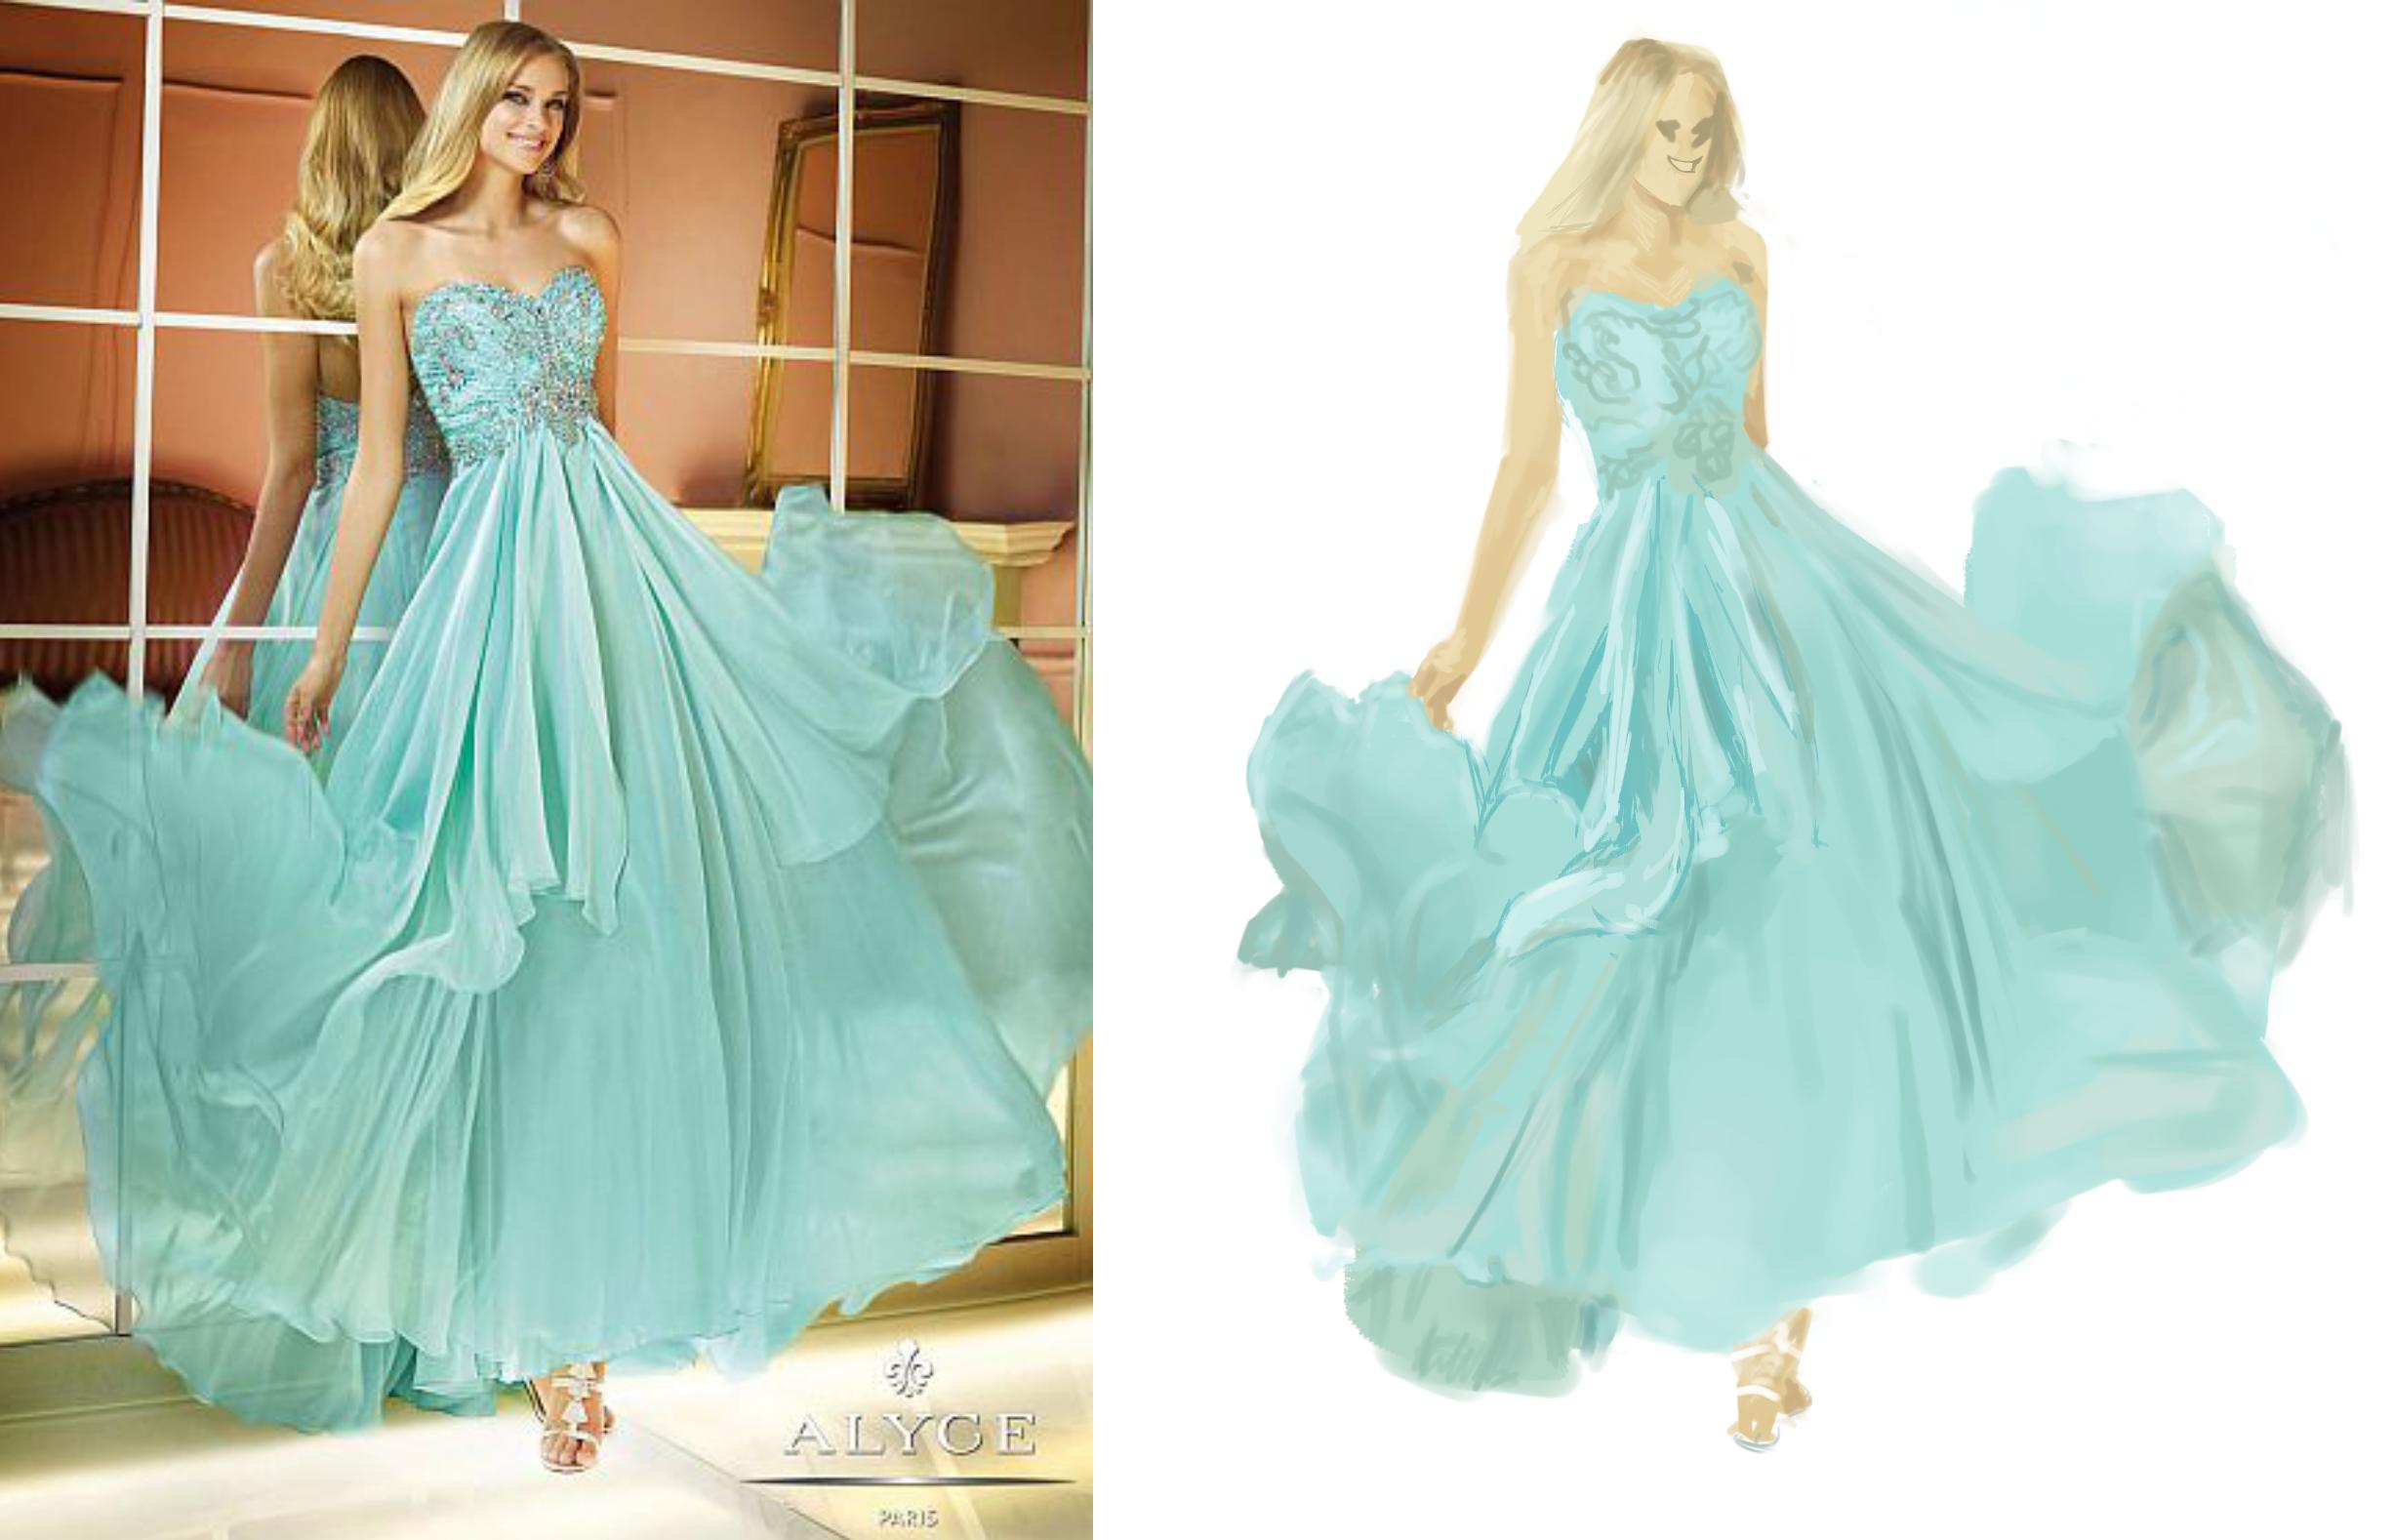 [Image: dress1.png]